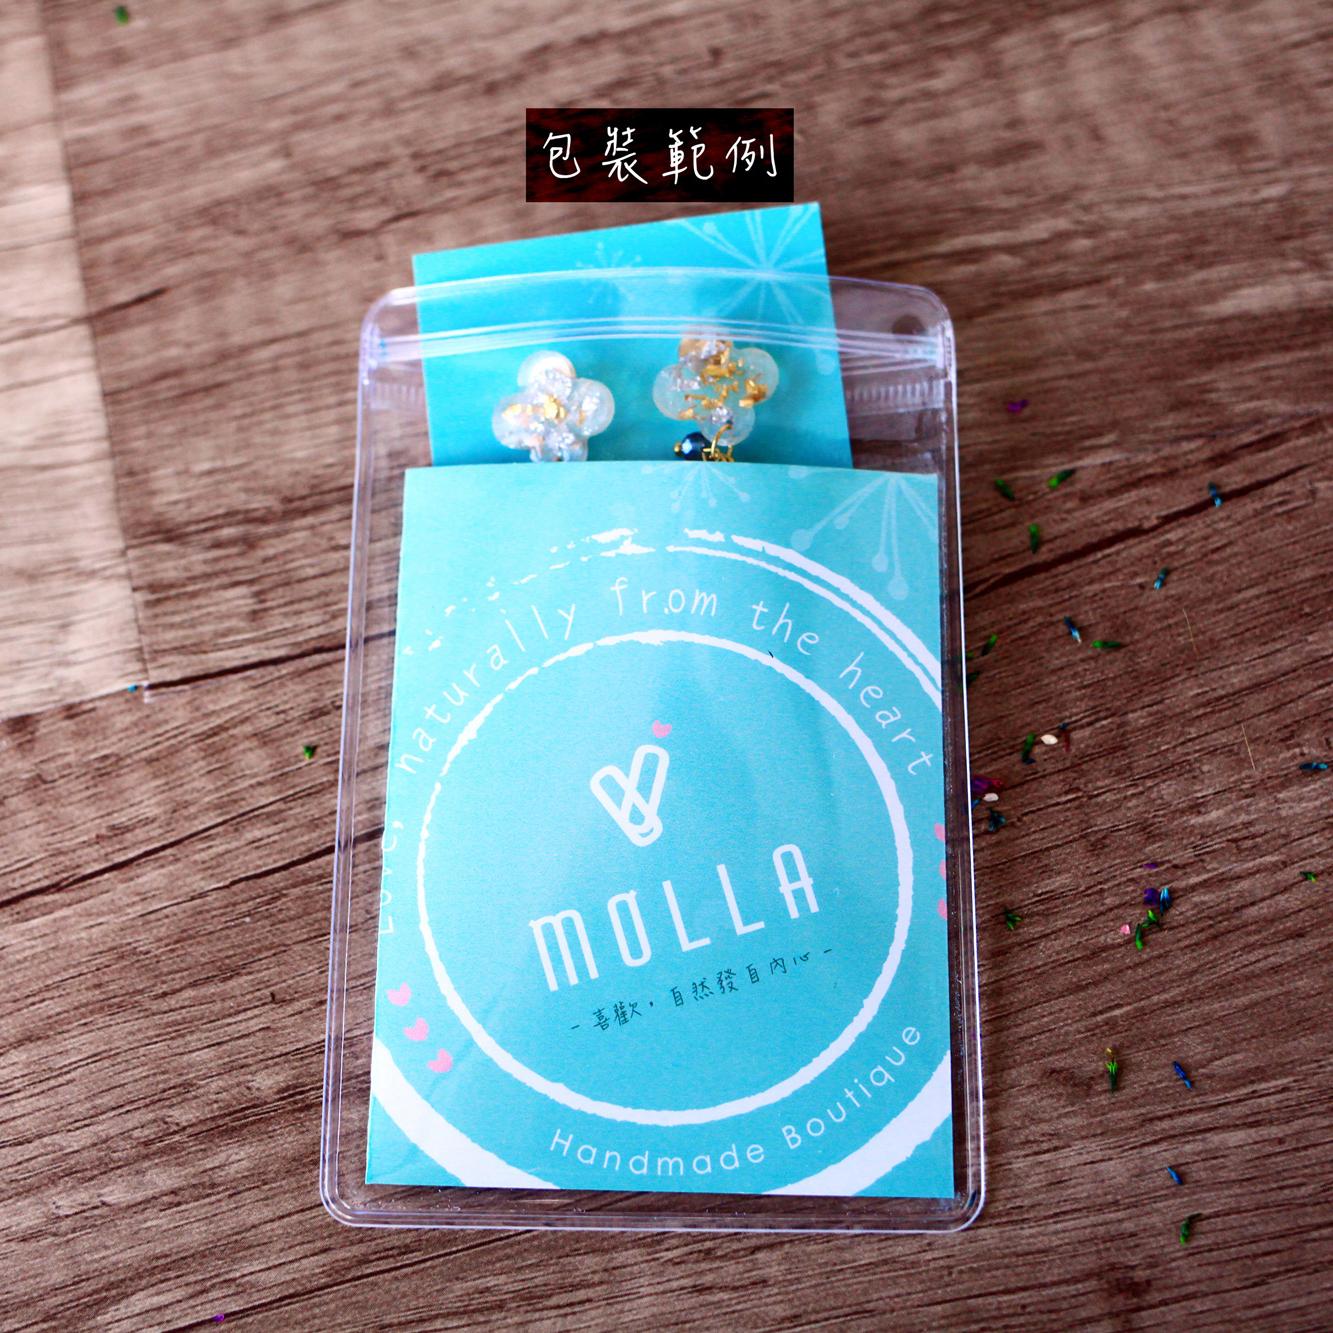 Molla 藍色奇幻海洋-小海龜吊飾(女生最愛手作吊飾、鑰匙圈、包包吊飾)